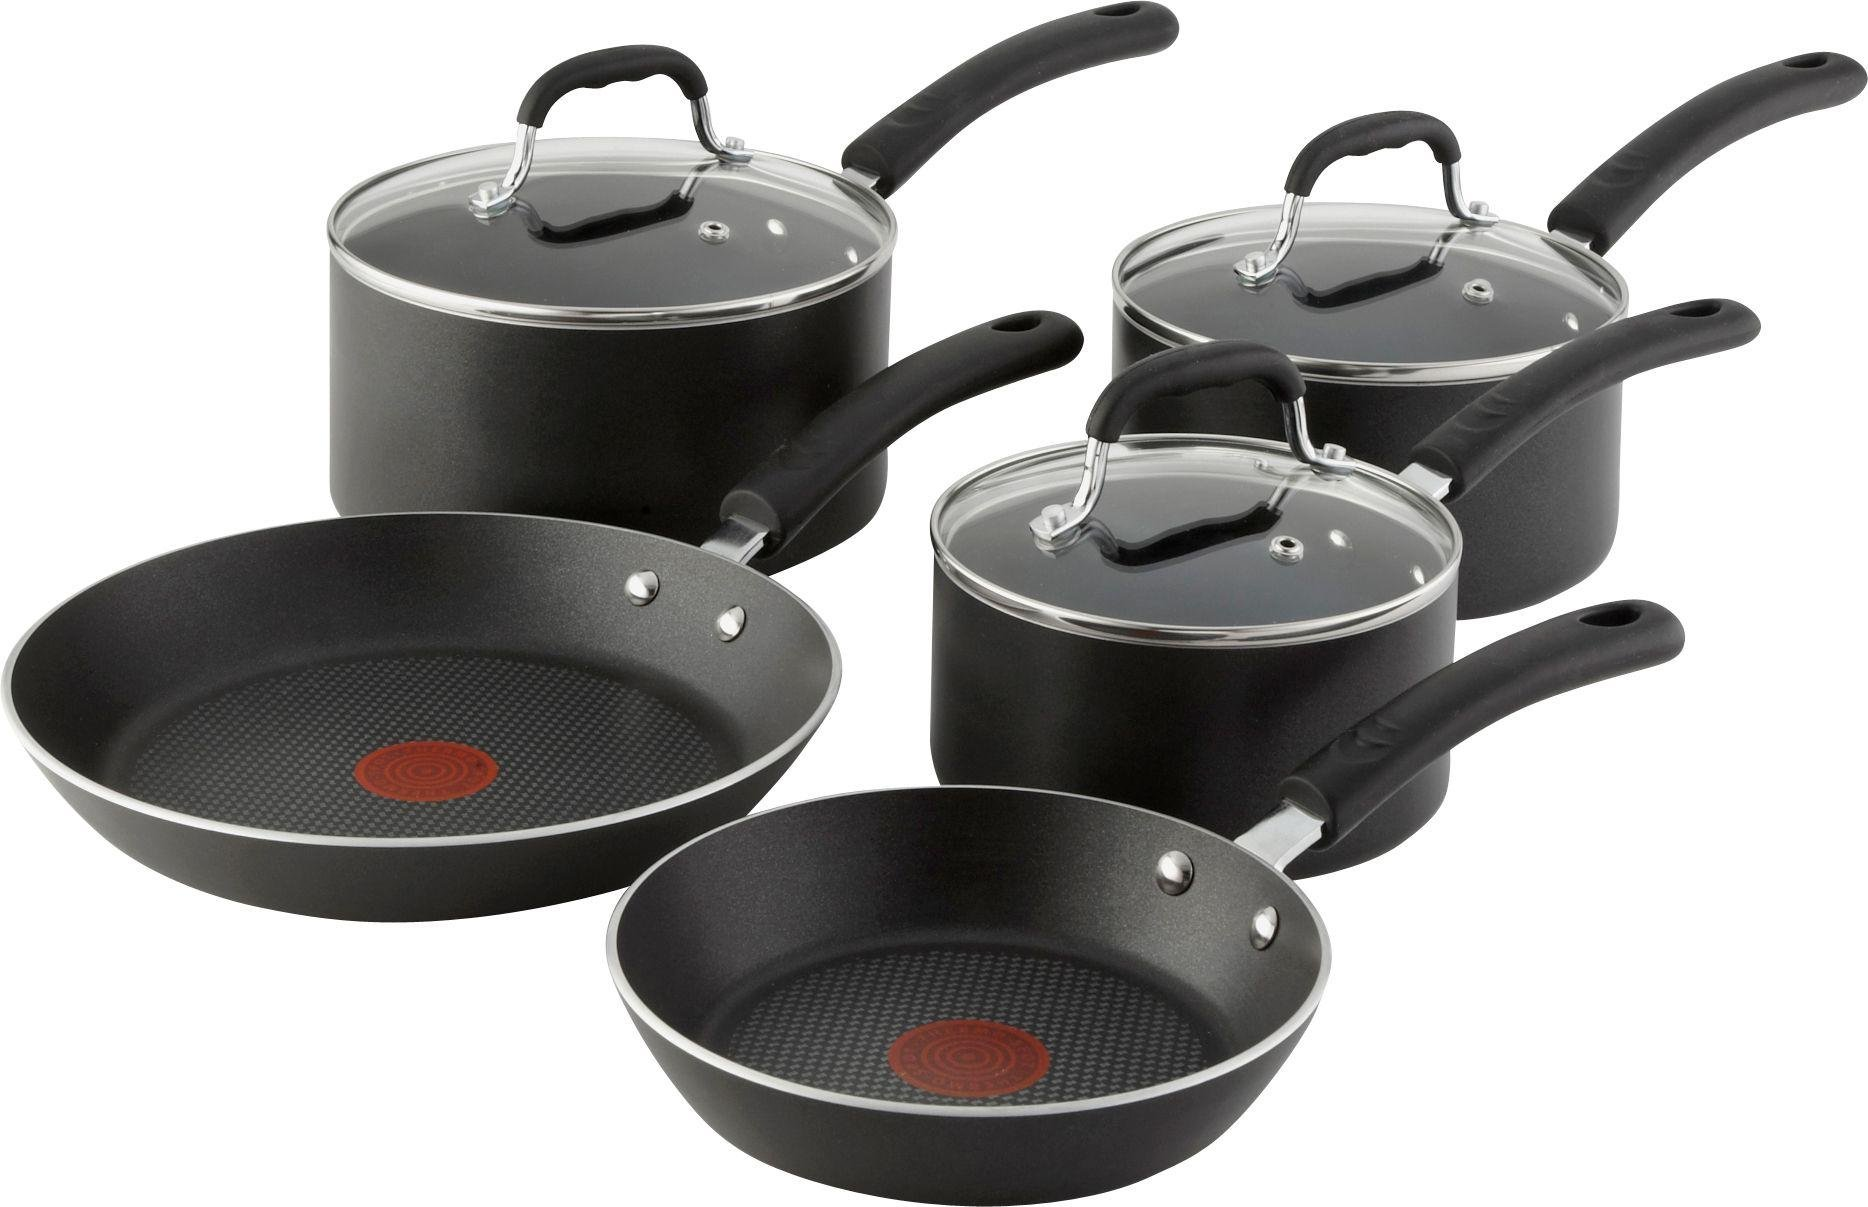 Non-Stick Frying Pan Tefal Saucepan Set Cookware 5 Piece Glass Lid